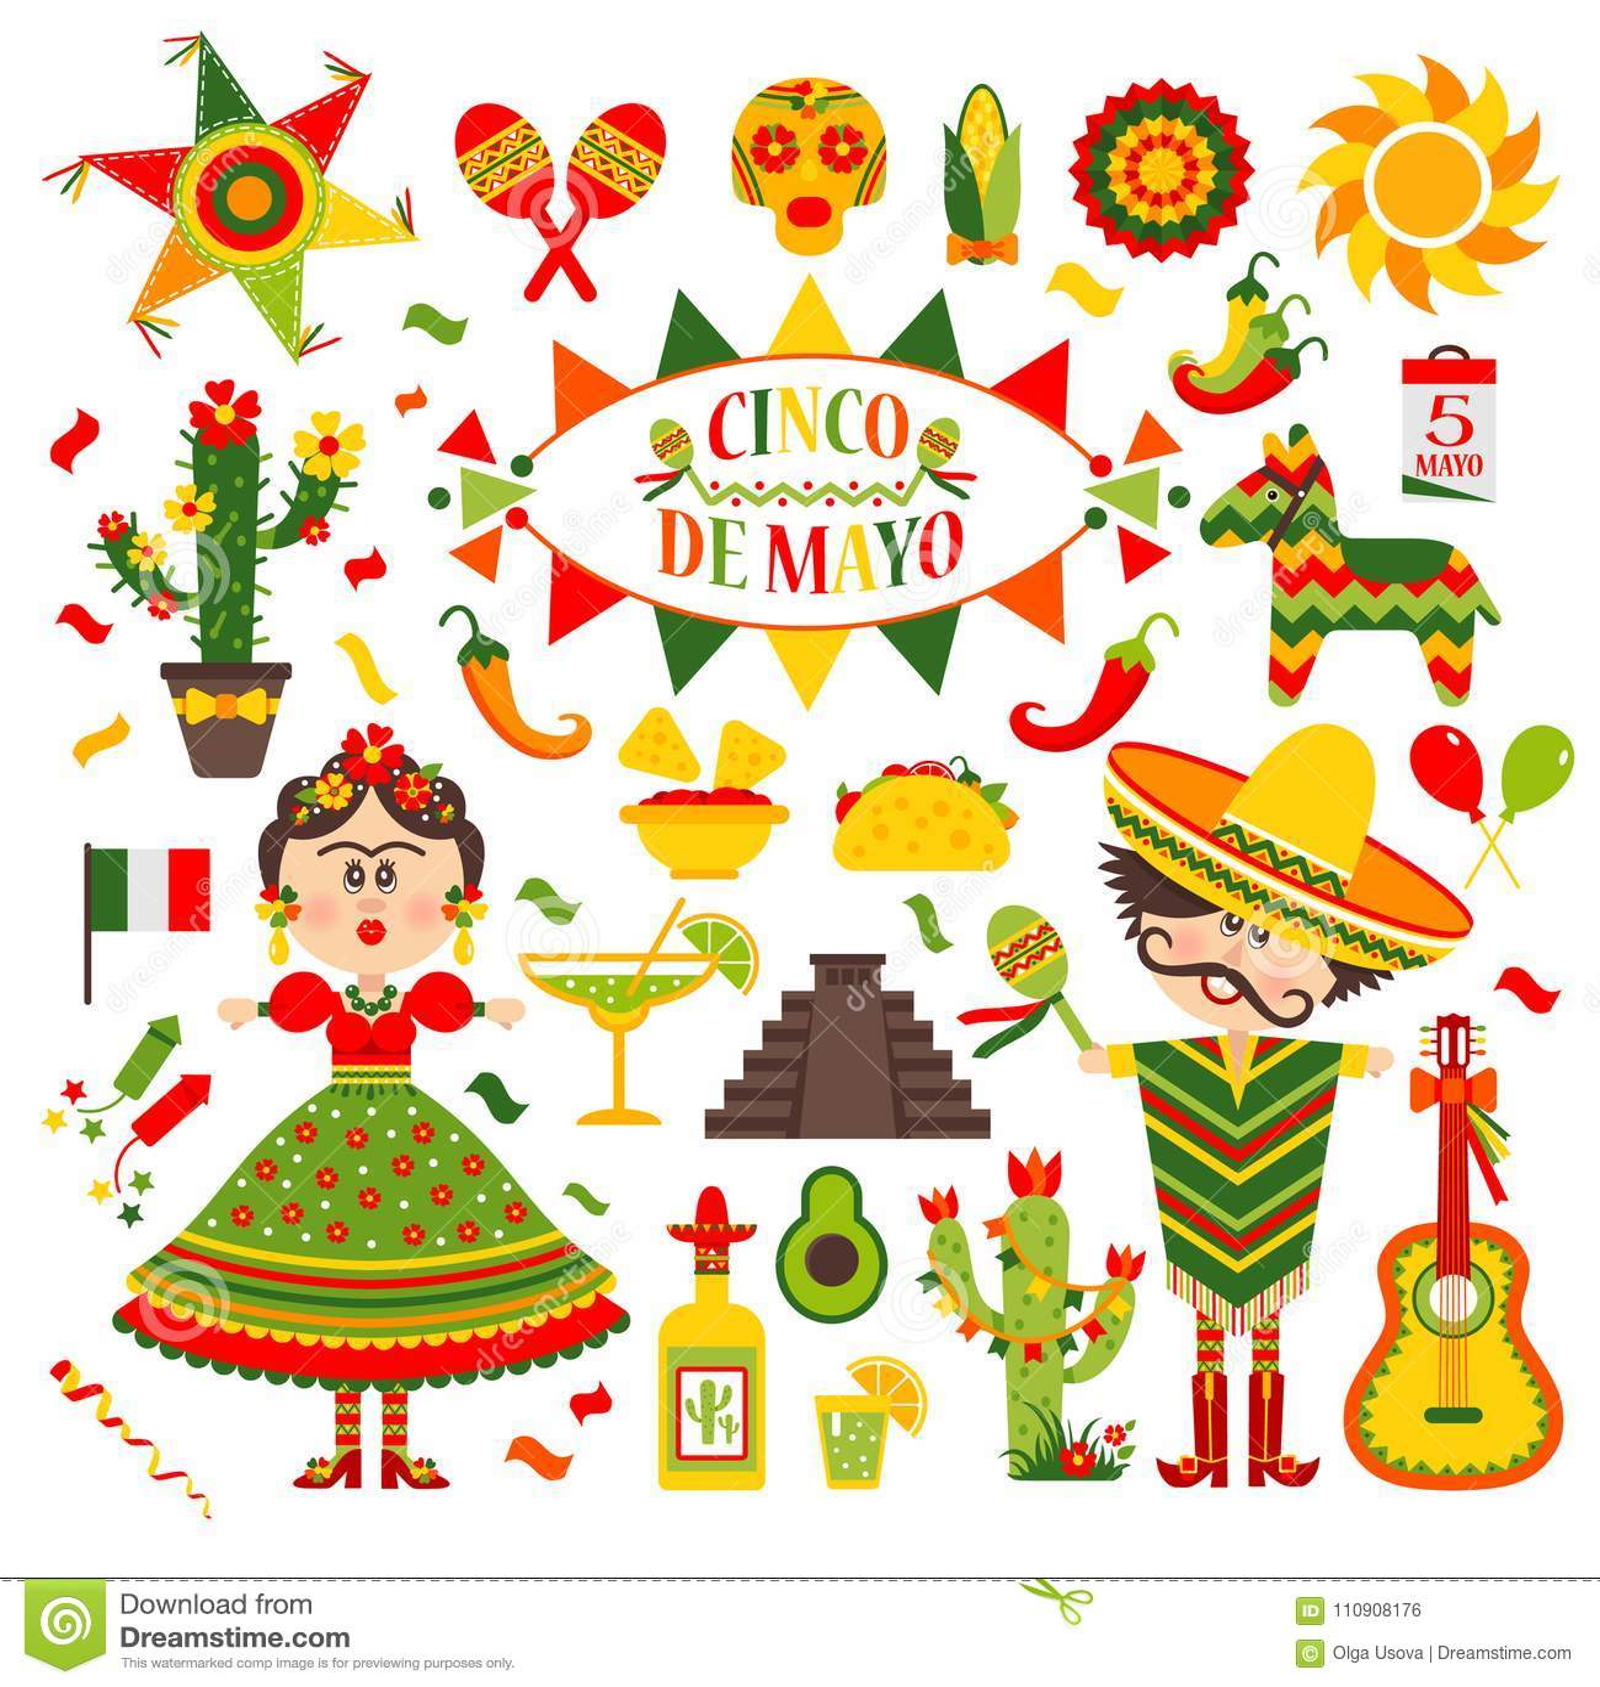 La celebración de Cinco de Mayo en México 00b82cf32e1